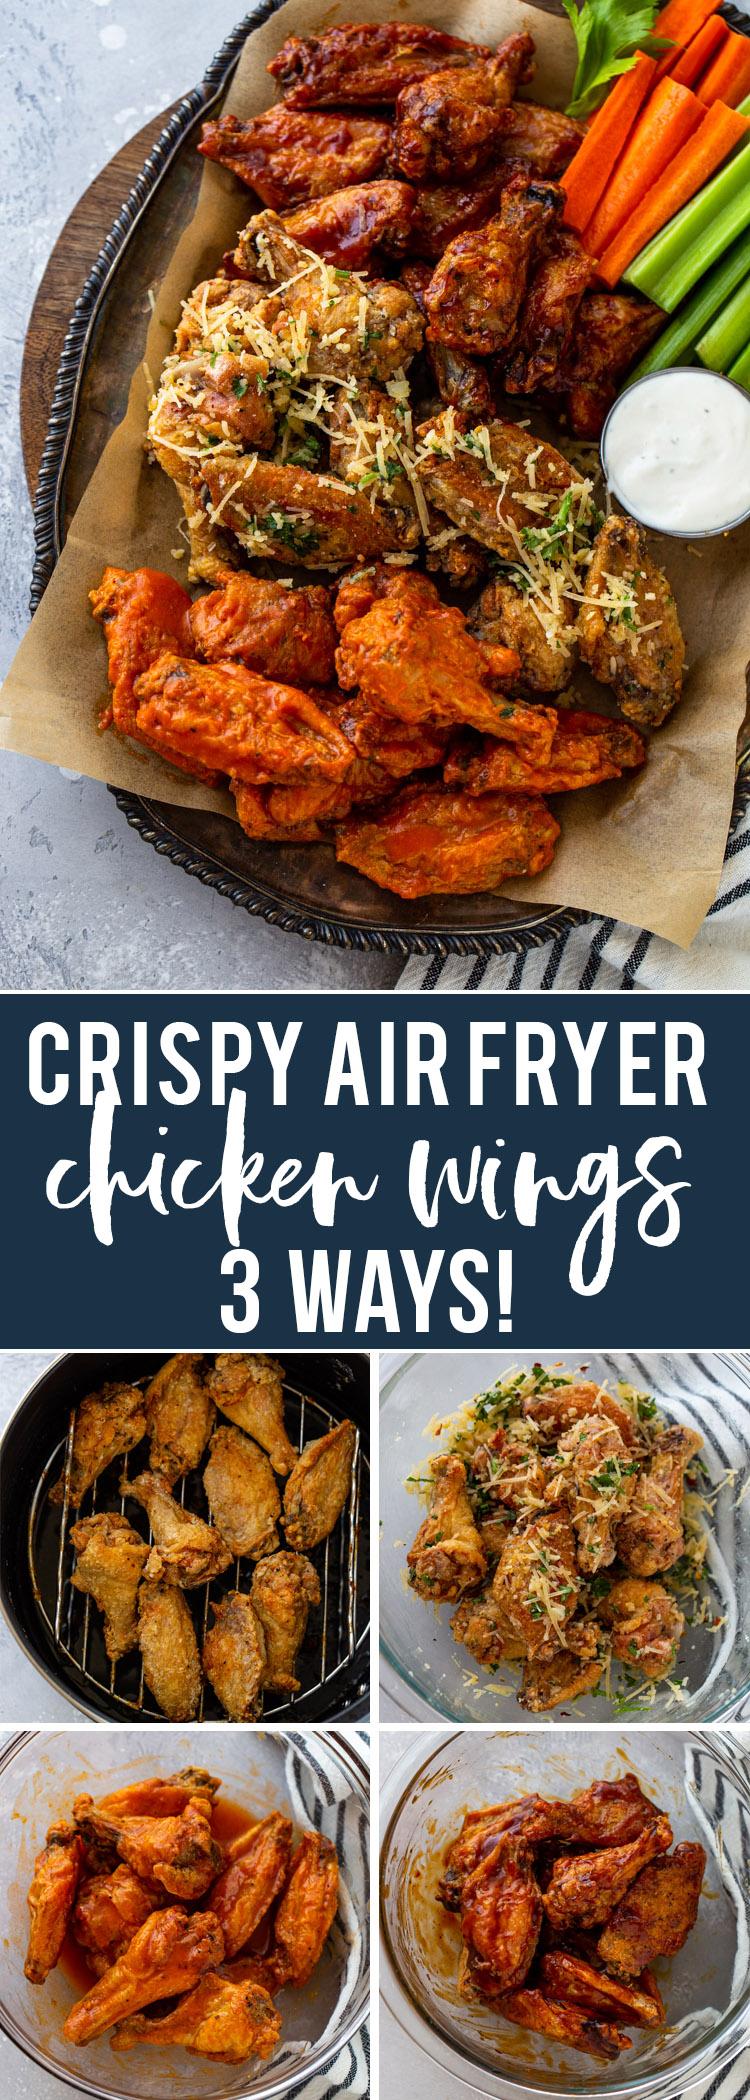 Super CRISPY Air Fryer Chicken Wings (3 Ways!)